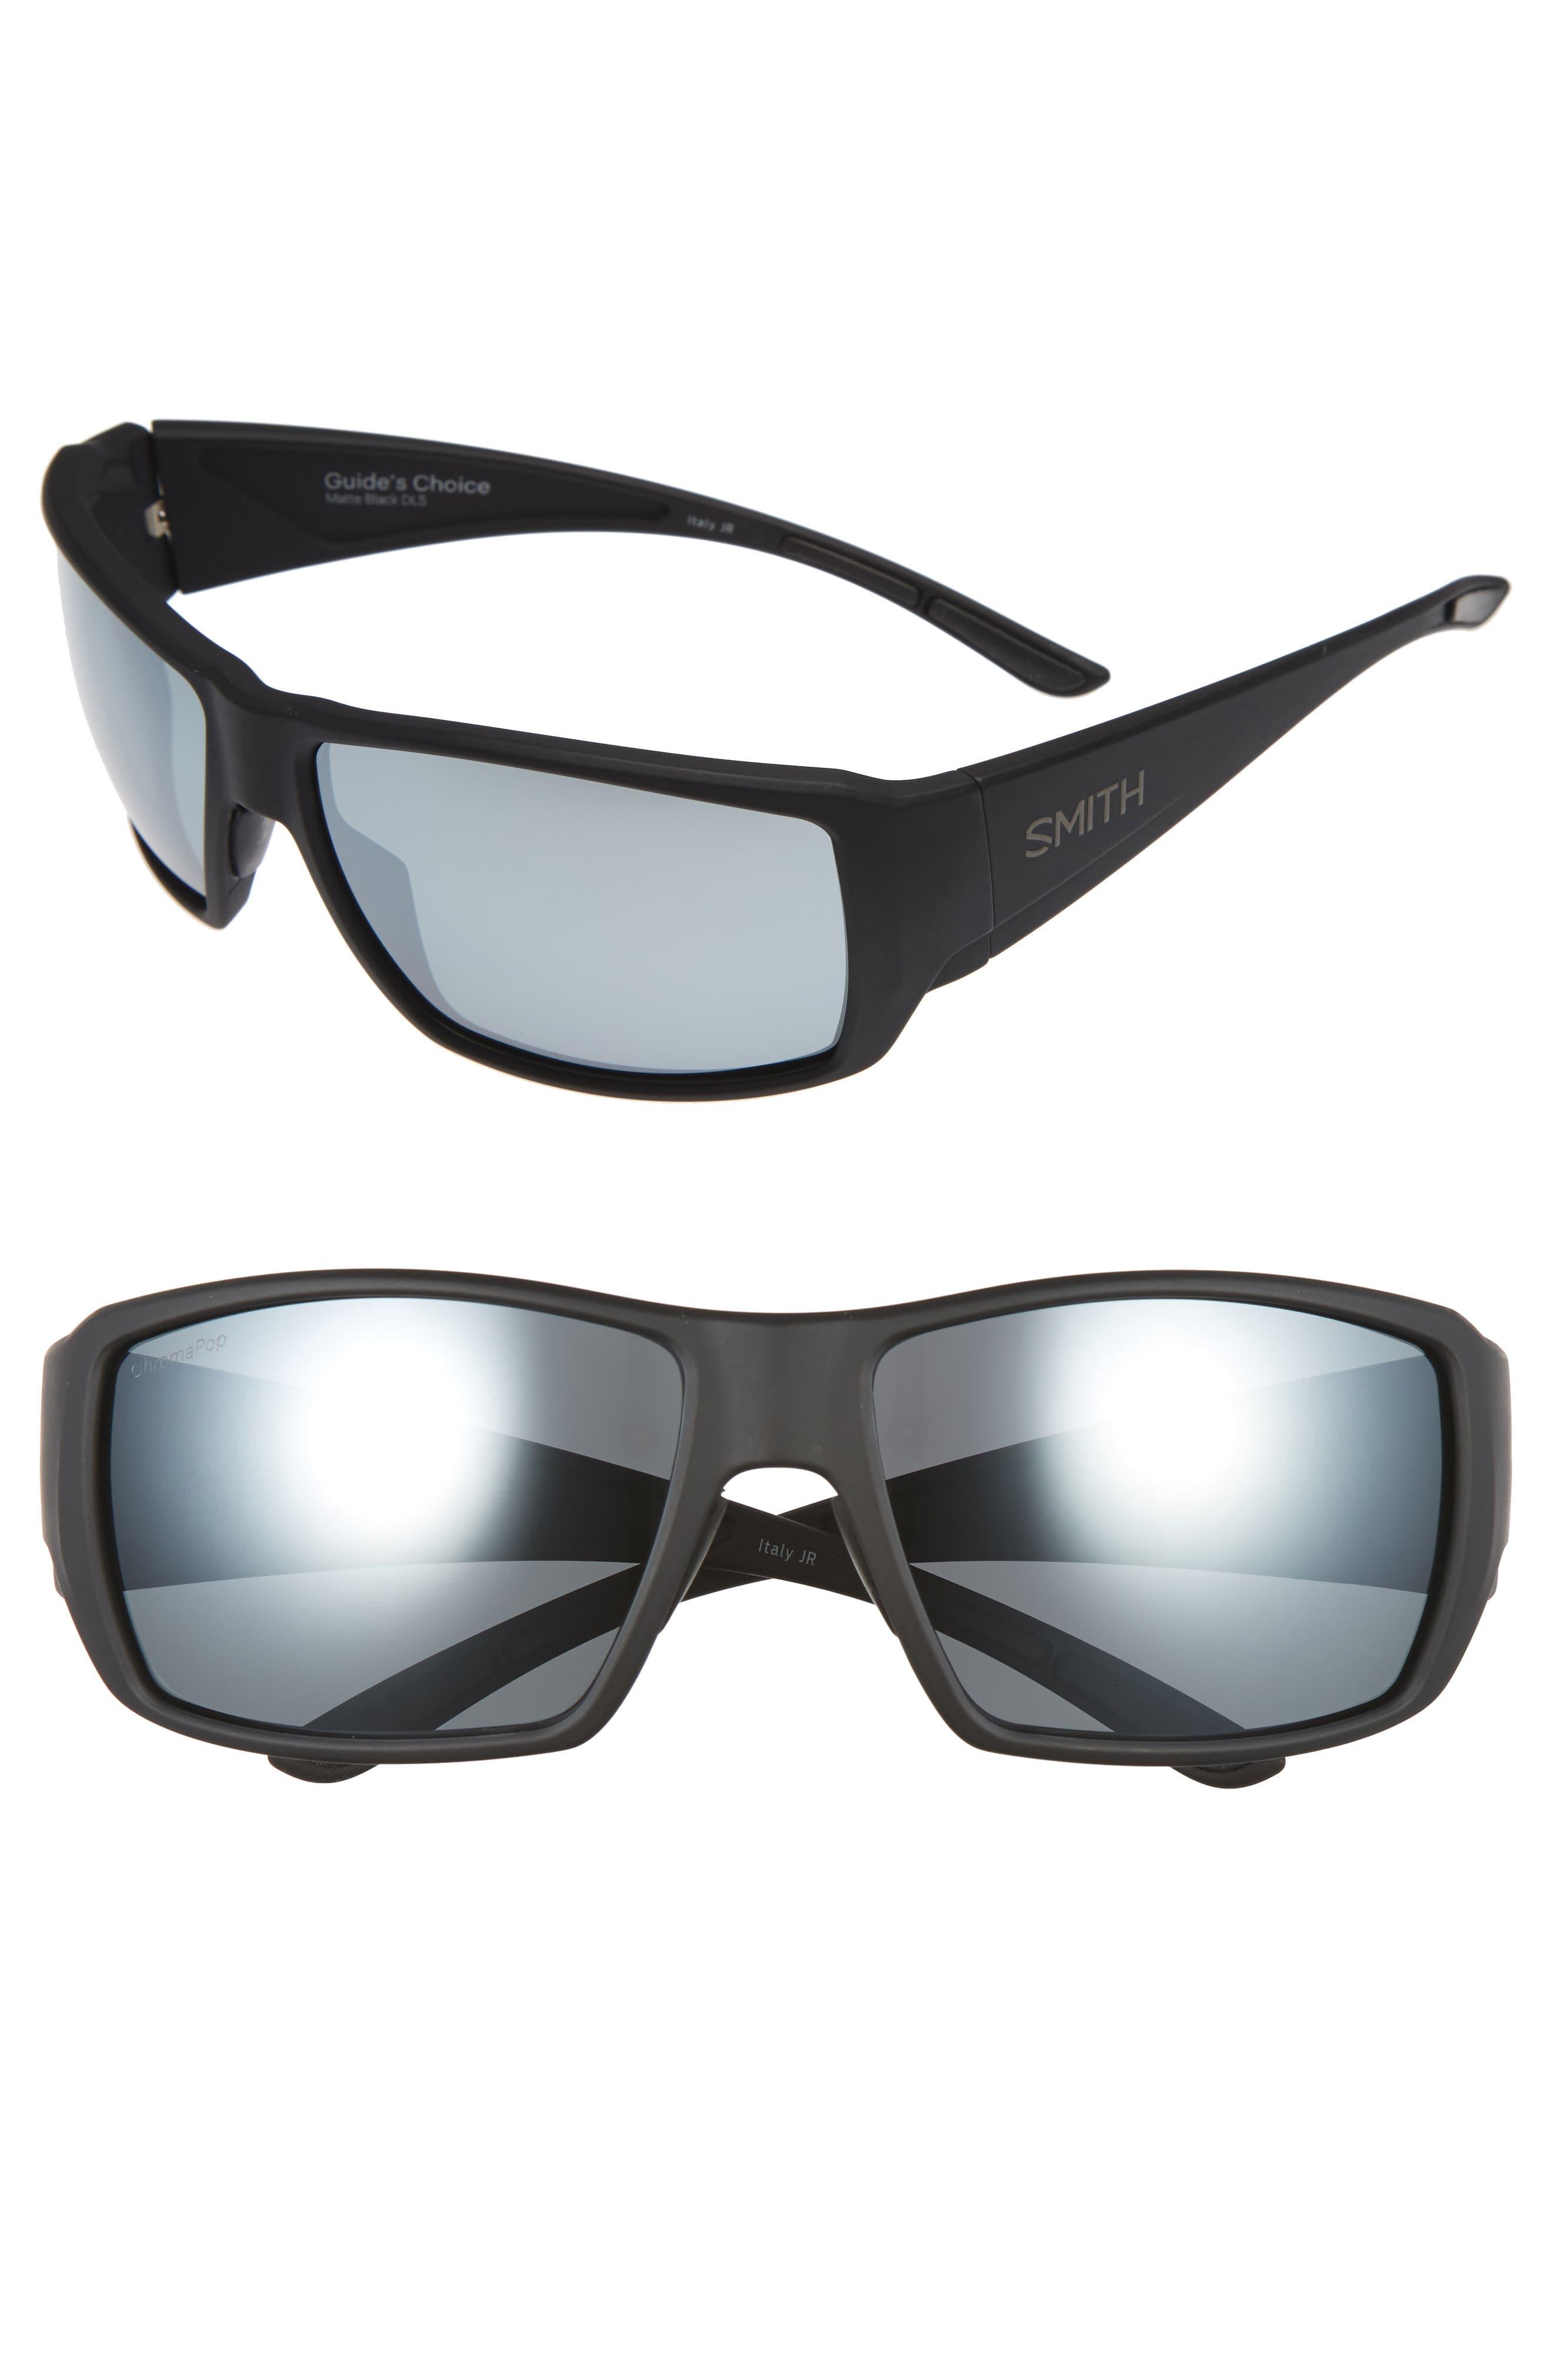 d33682333678 Smith  Guide S Choice  62Mm Polarized Sunglasses - Matte Black  Platinum